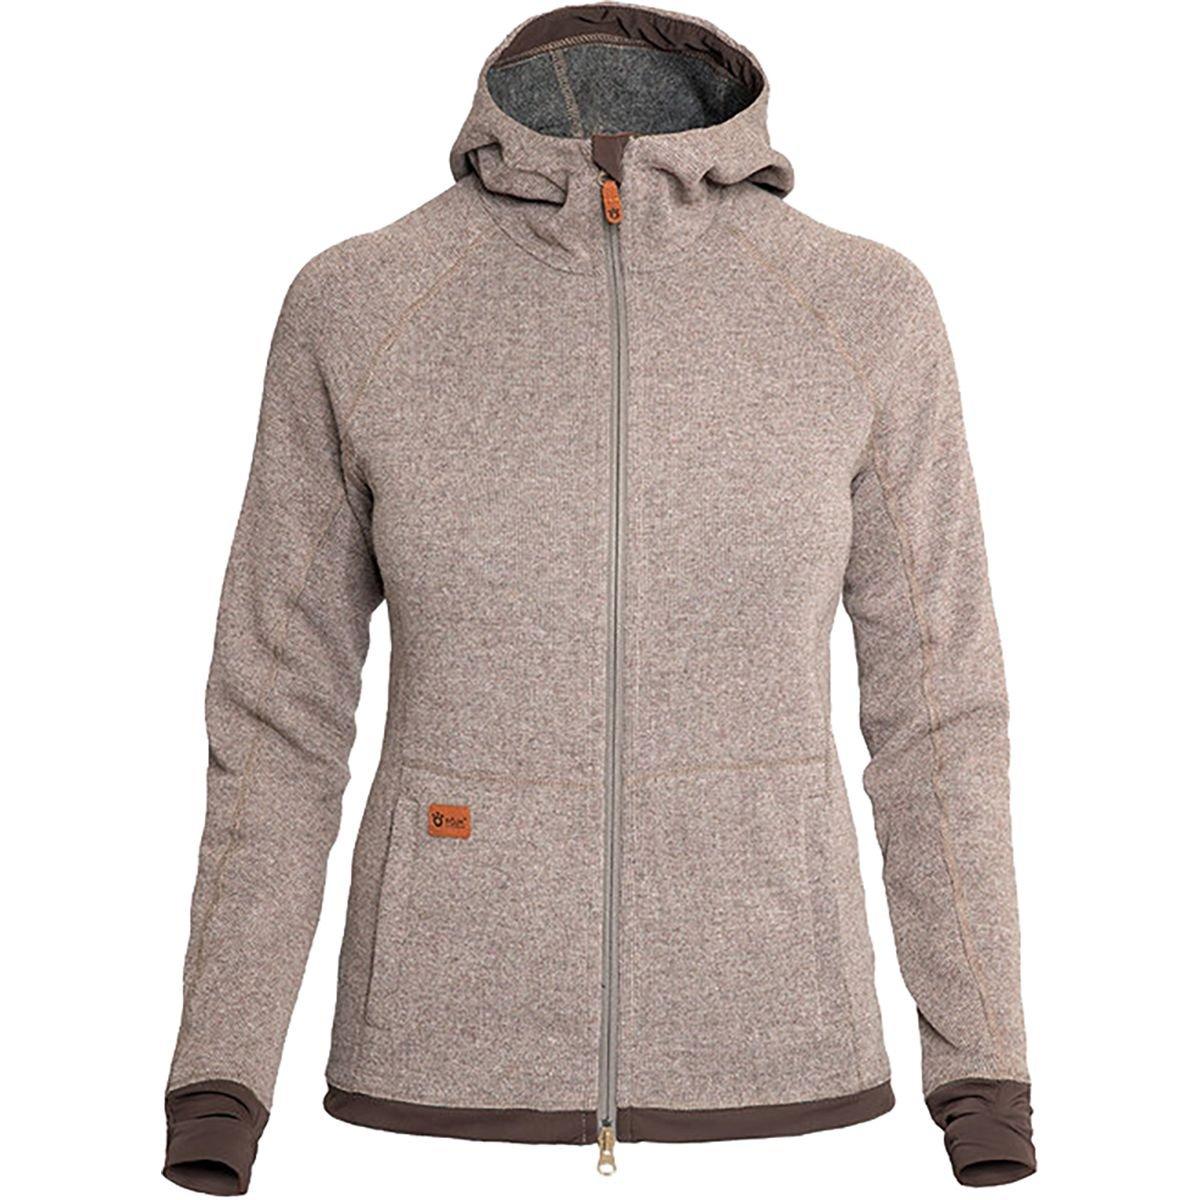 Rojk Superwear Eskimo Hoodie – Women 's Medium ヘーゼル B078881VQM